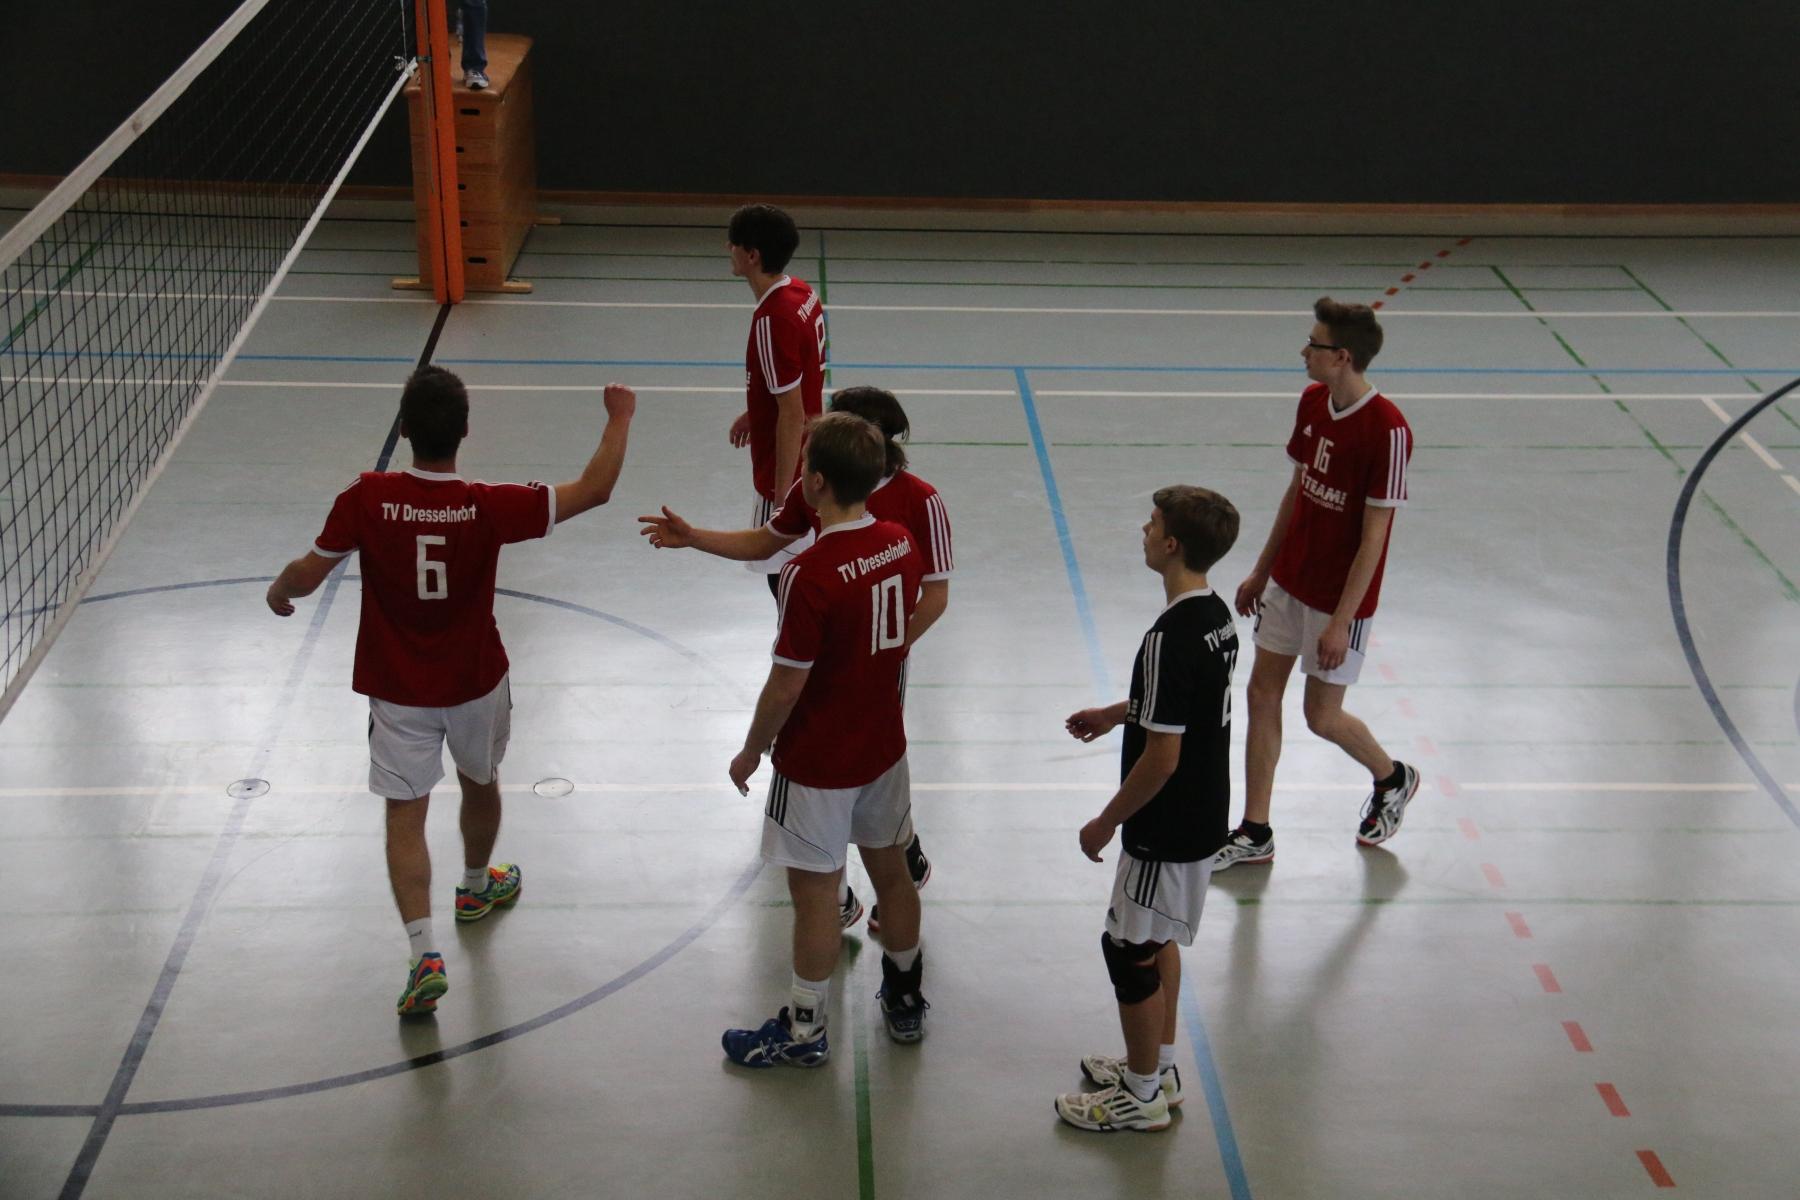 TVD-2-vs-Morsbach-008-54